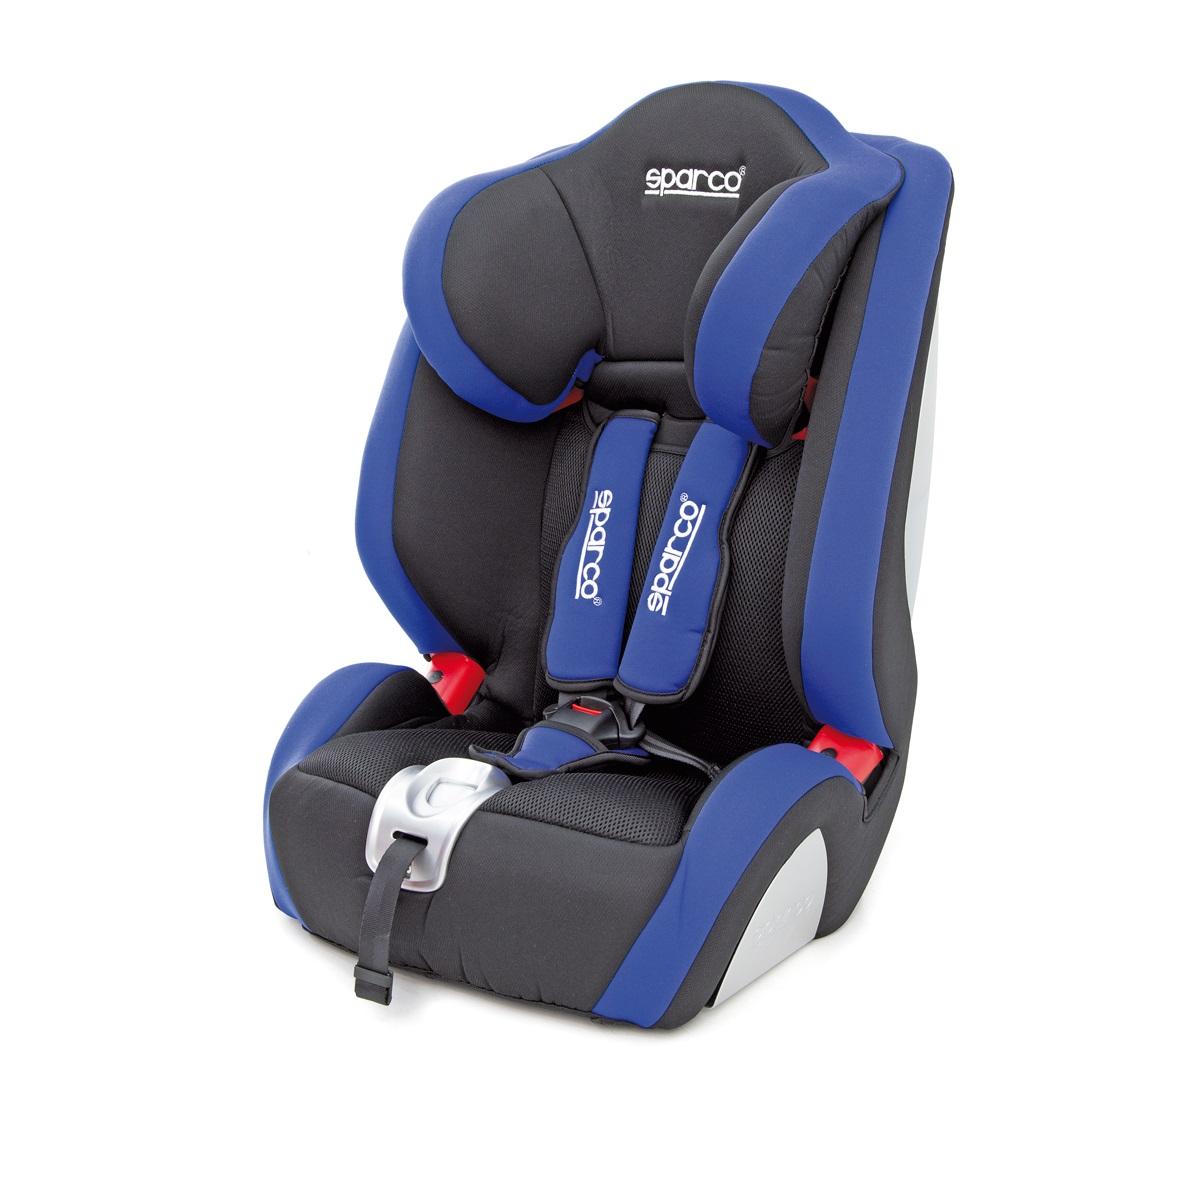 Сиденье Sparco Spc/dk-350 bk/bl сиденье sparco spc dk 500 bk bl